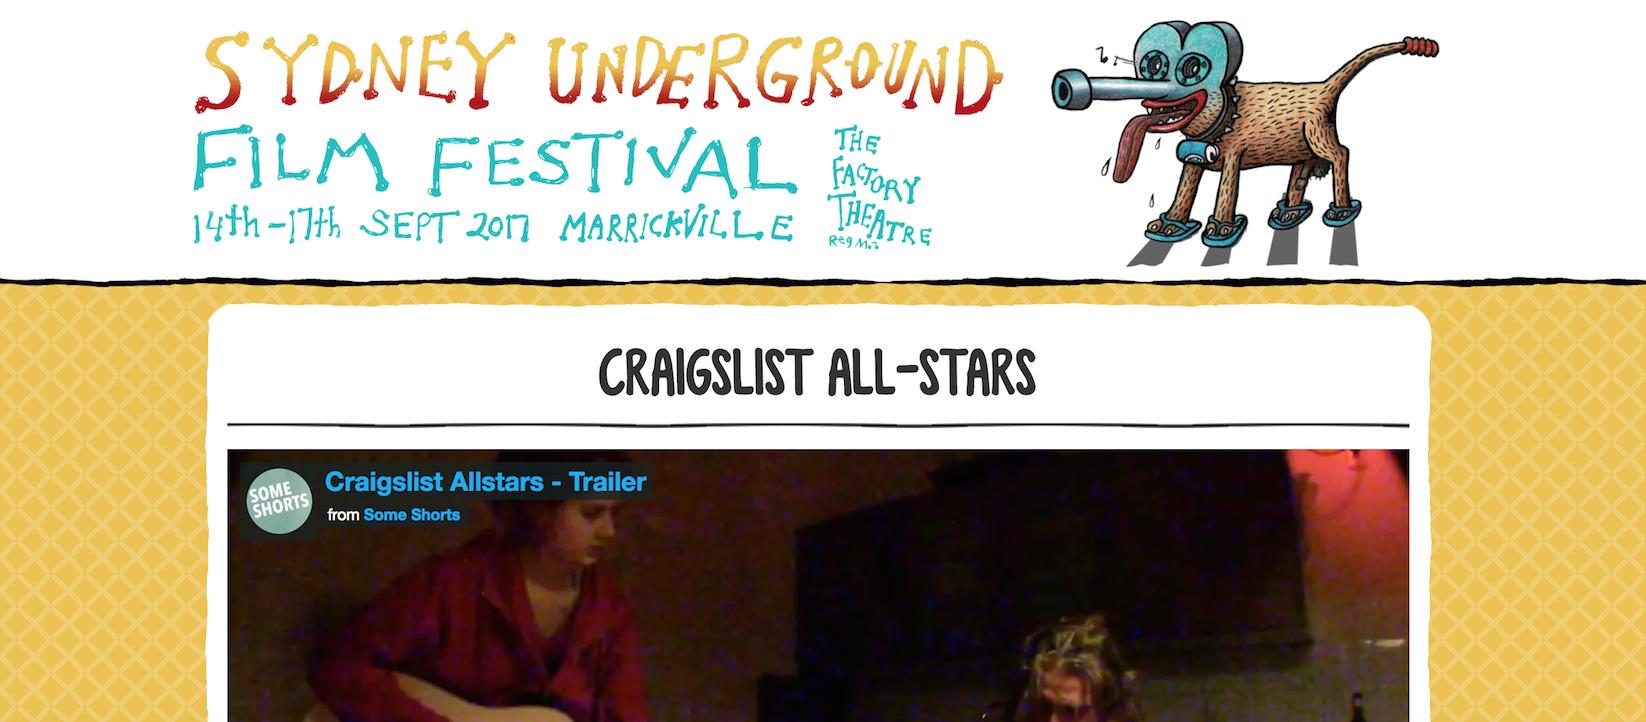 Craigslist Allstars at the Sydney Underground Film Festival 16th of September